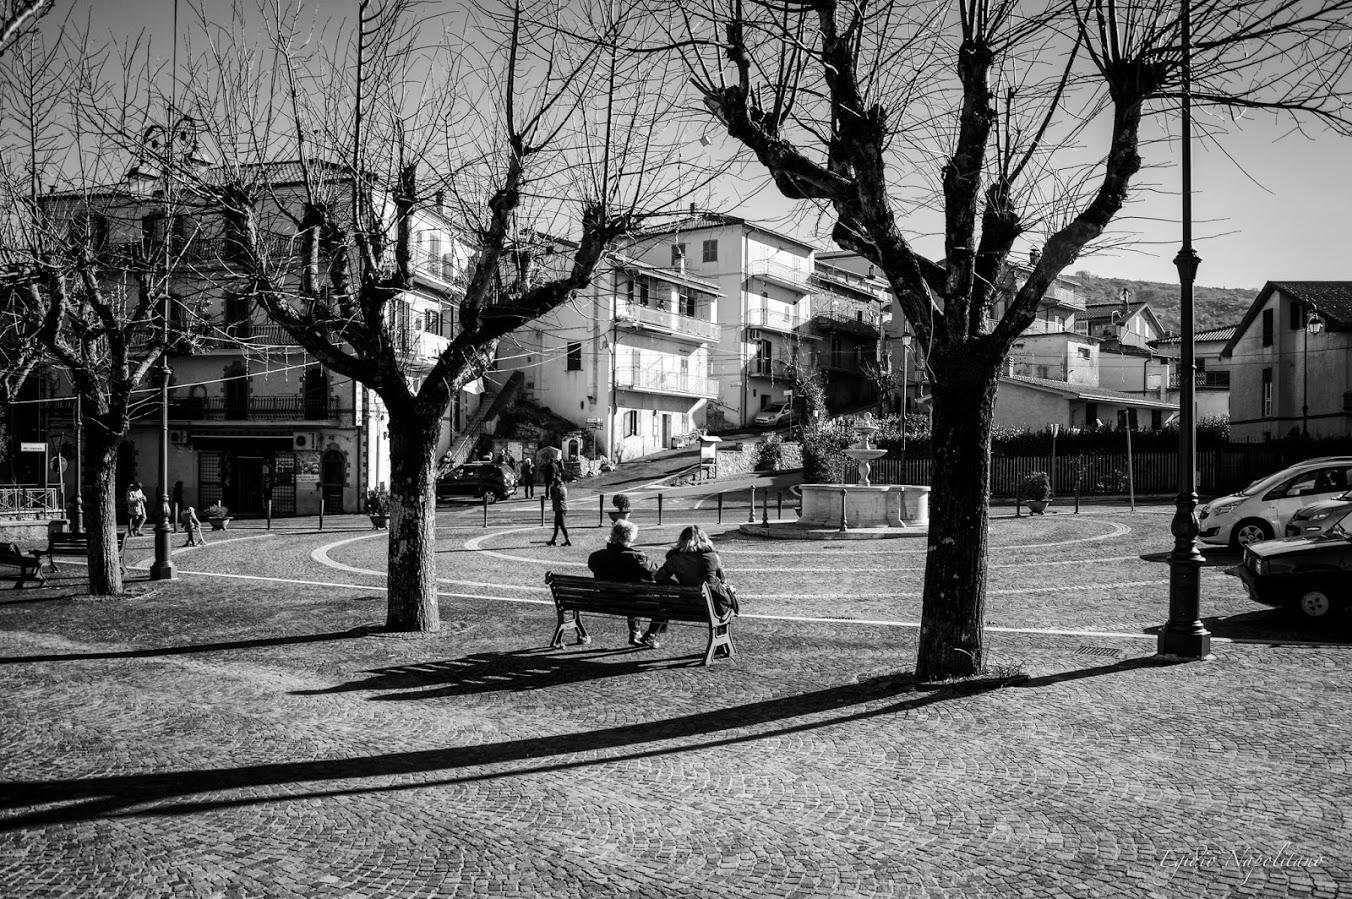 Street photography - Egidio Napolitano